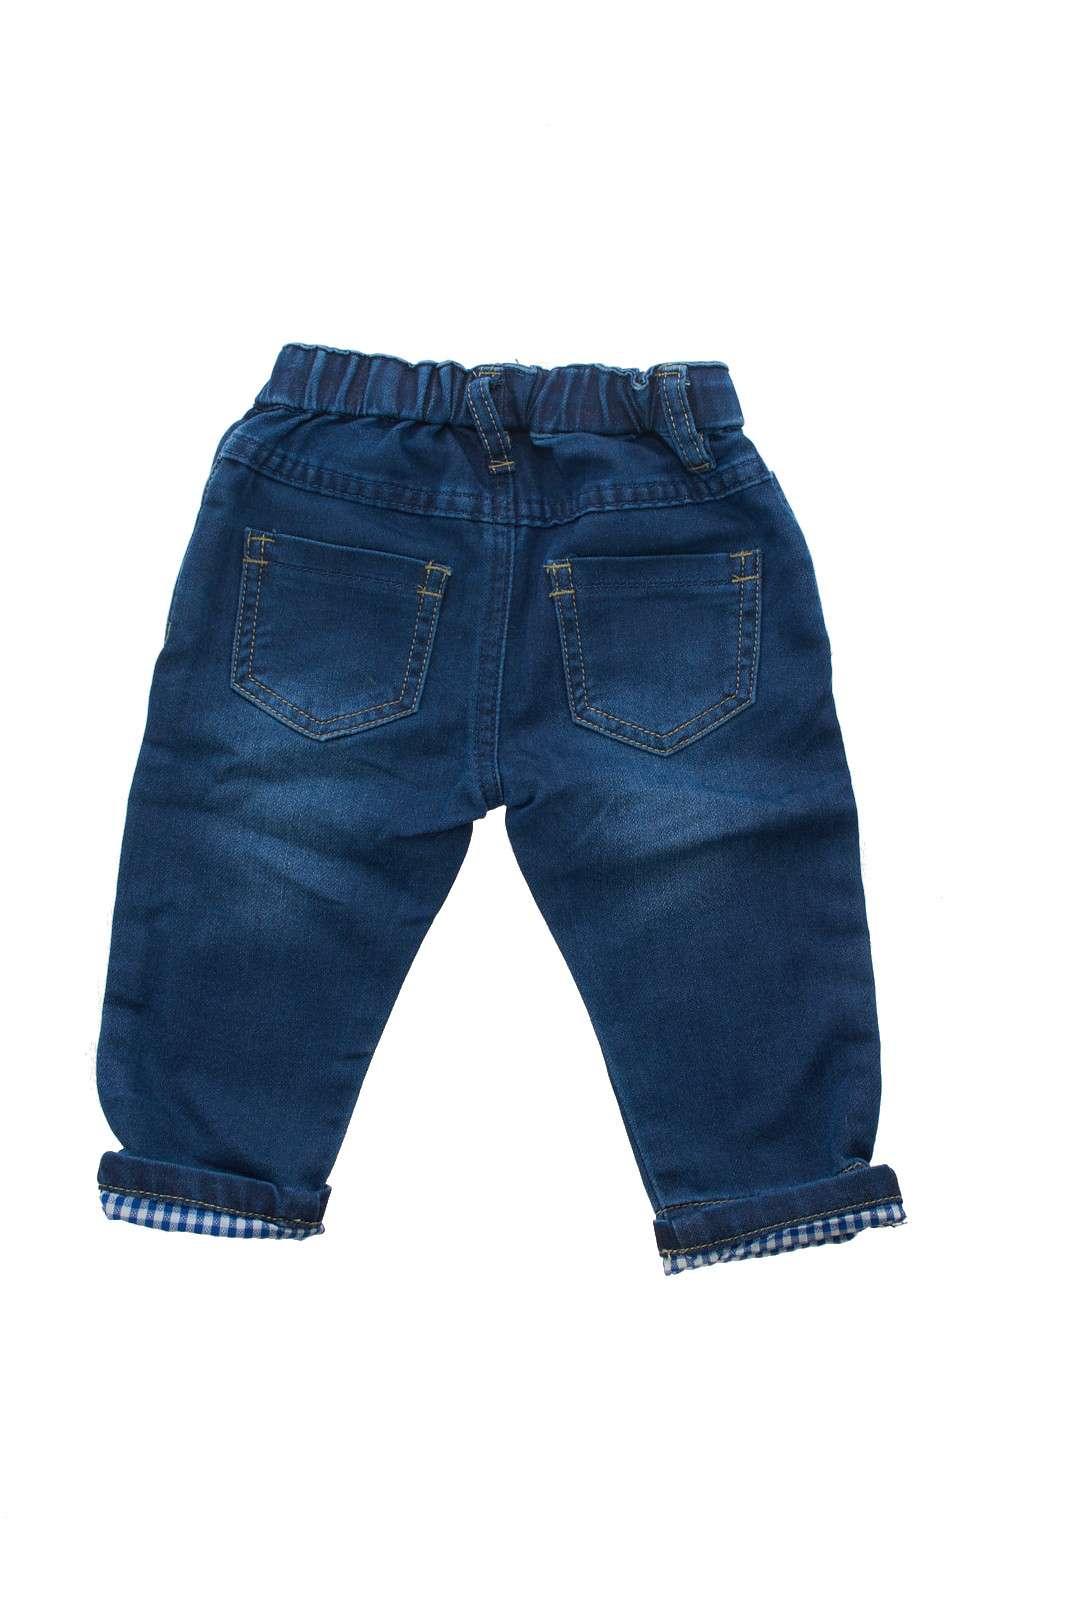 https://www.parmax.com/media/catalog/product/a/i/PE-outlet_parmax-pantaloni-bambino-Fun-e-Fun-21022020-B.jpg